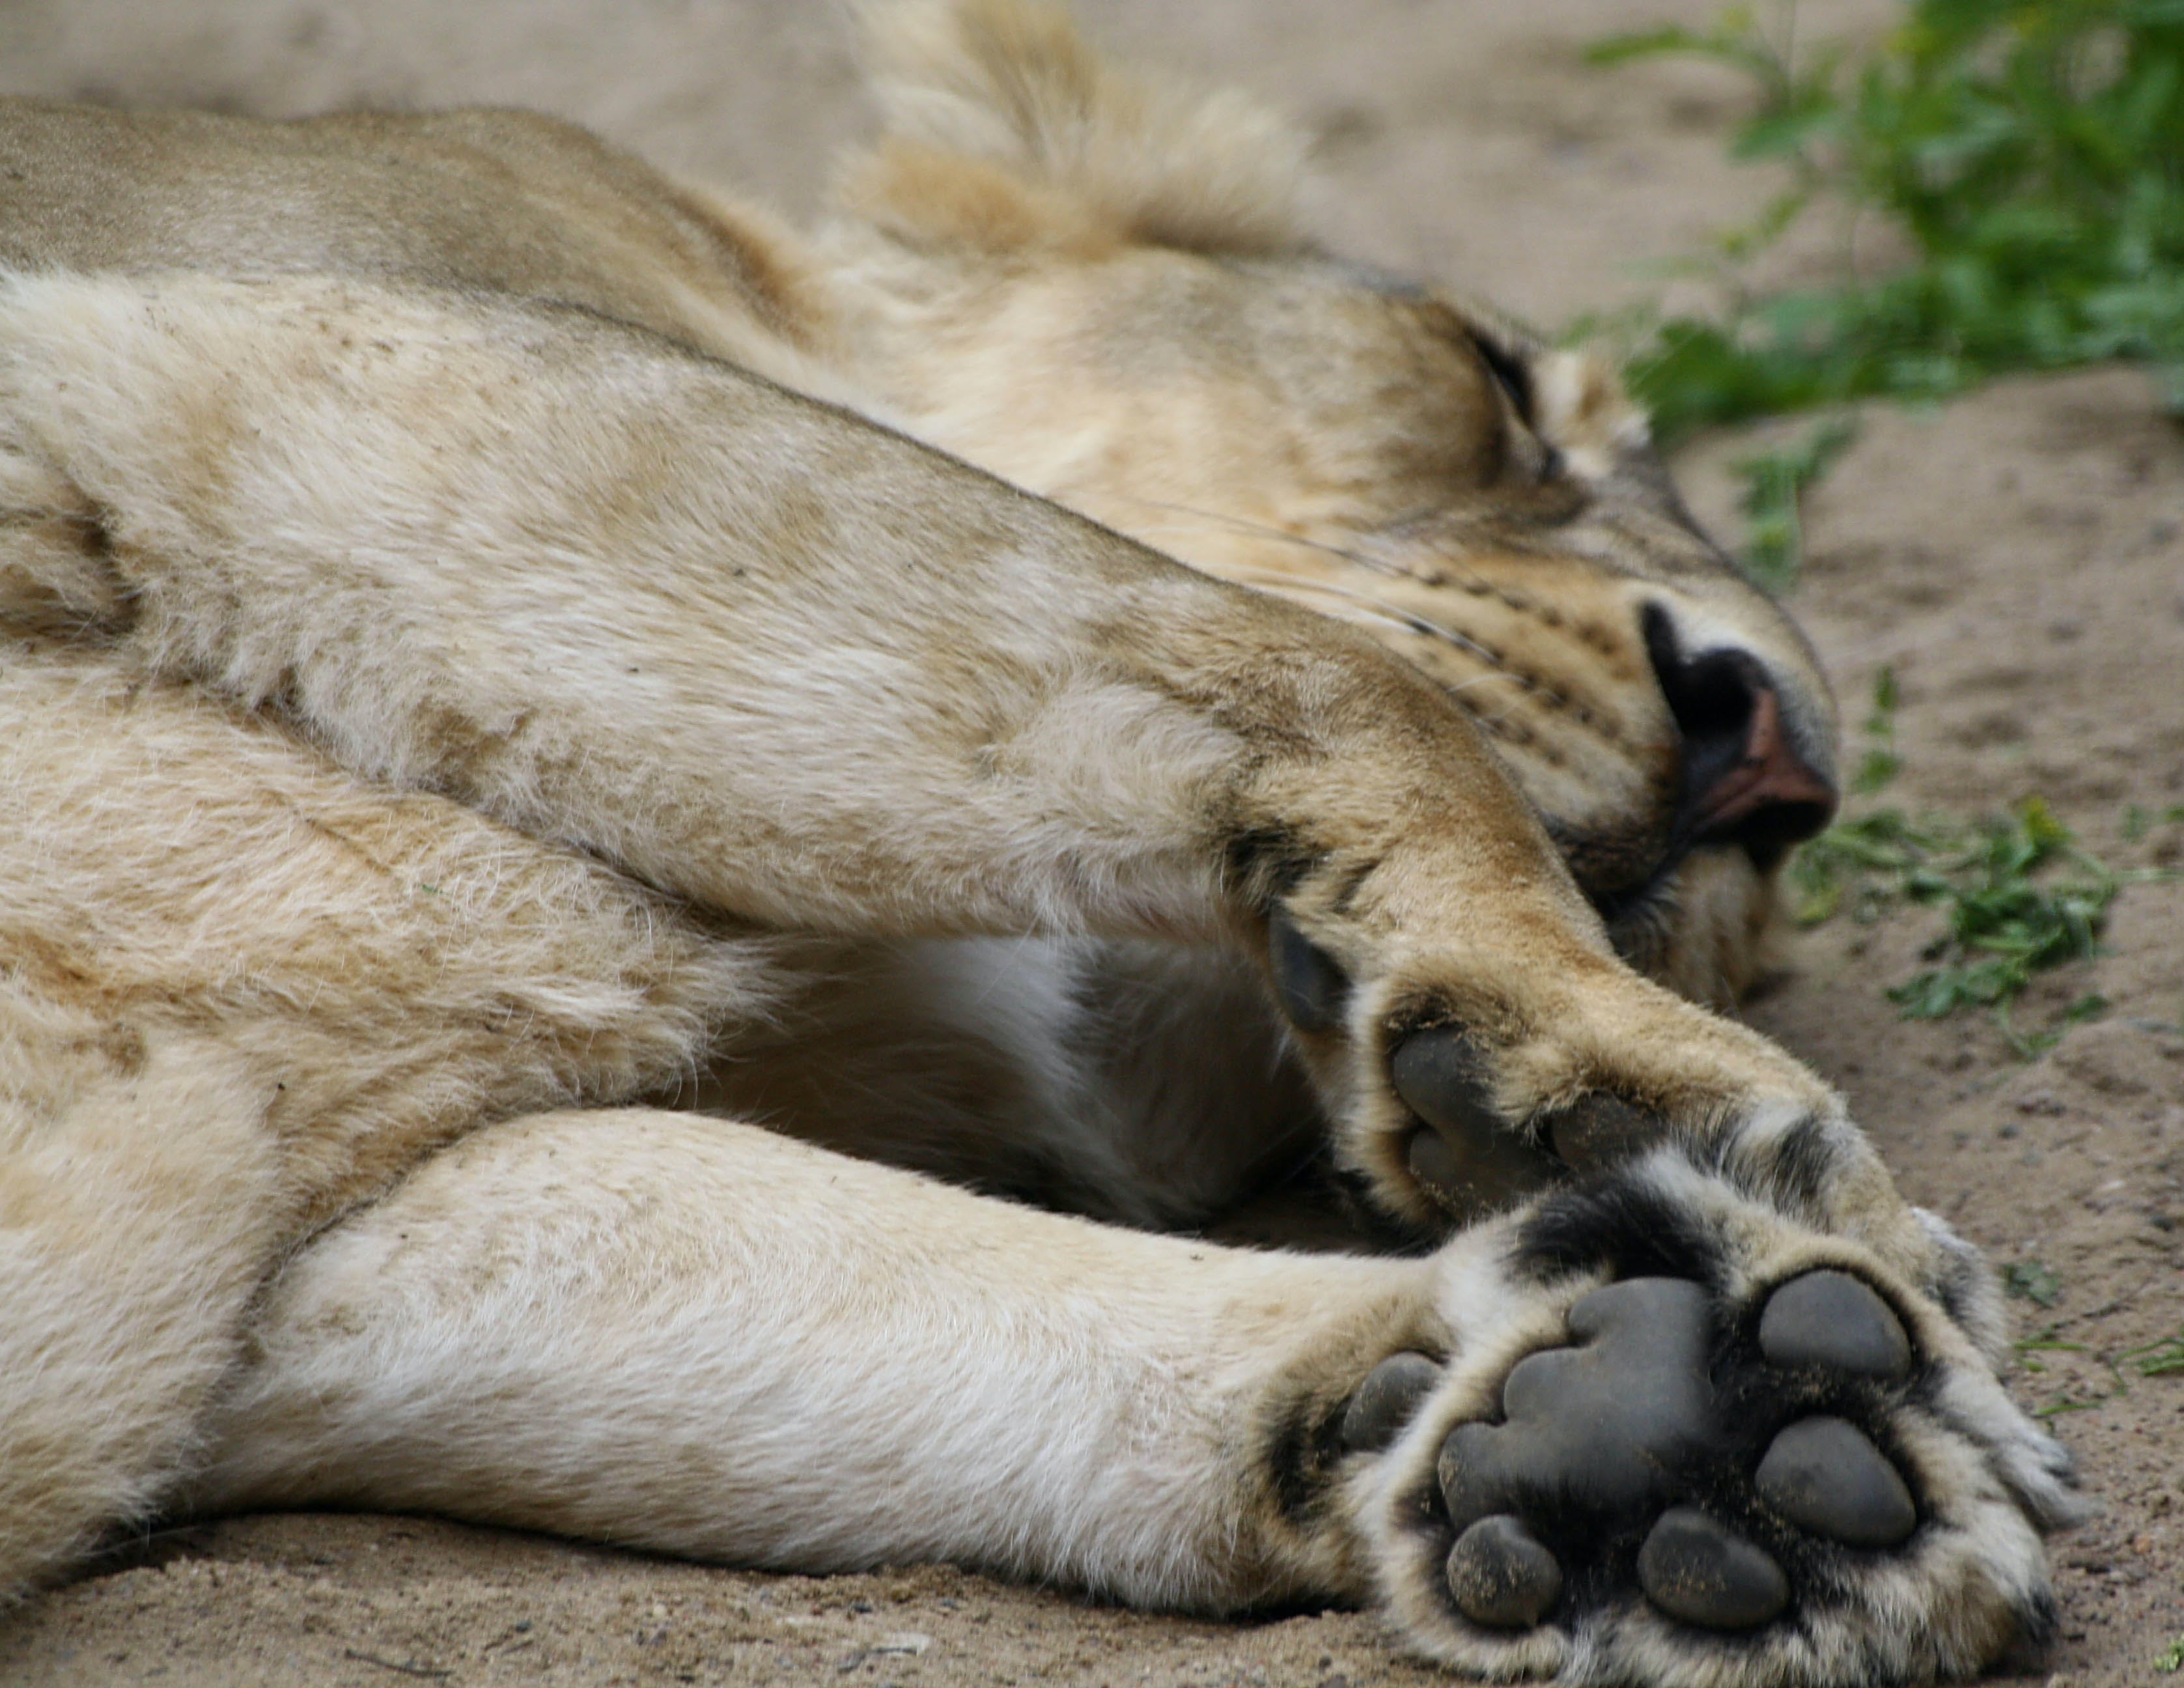 Free stock photo of lion, lion's foot, sleeping lion